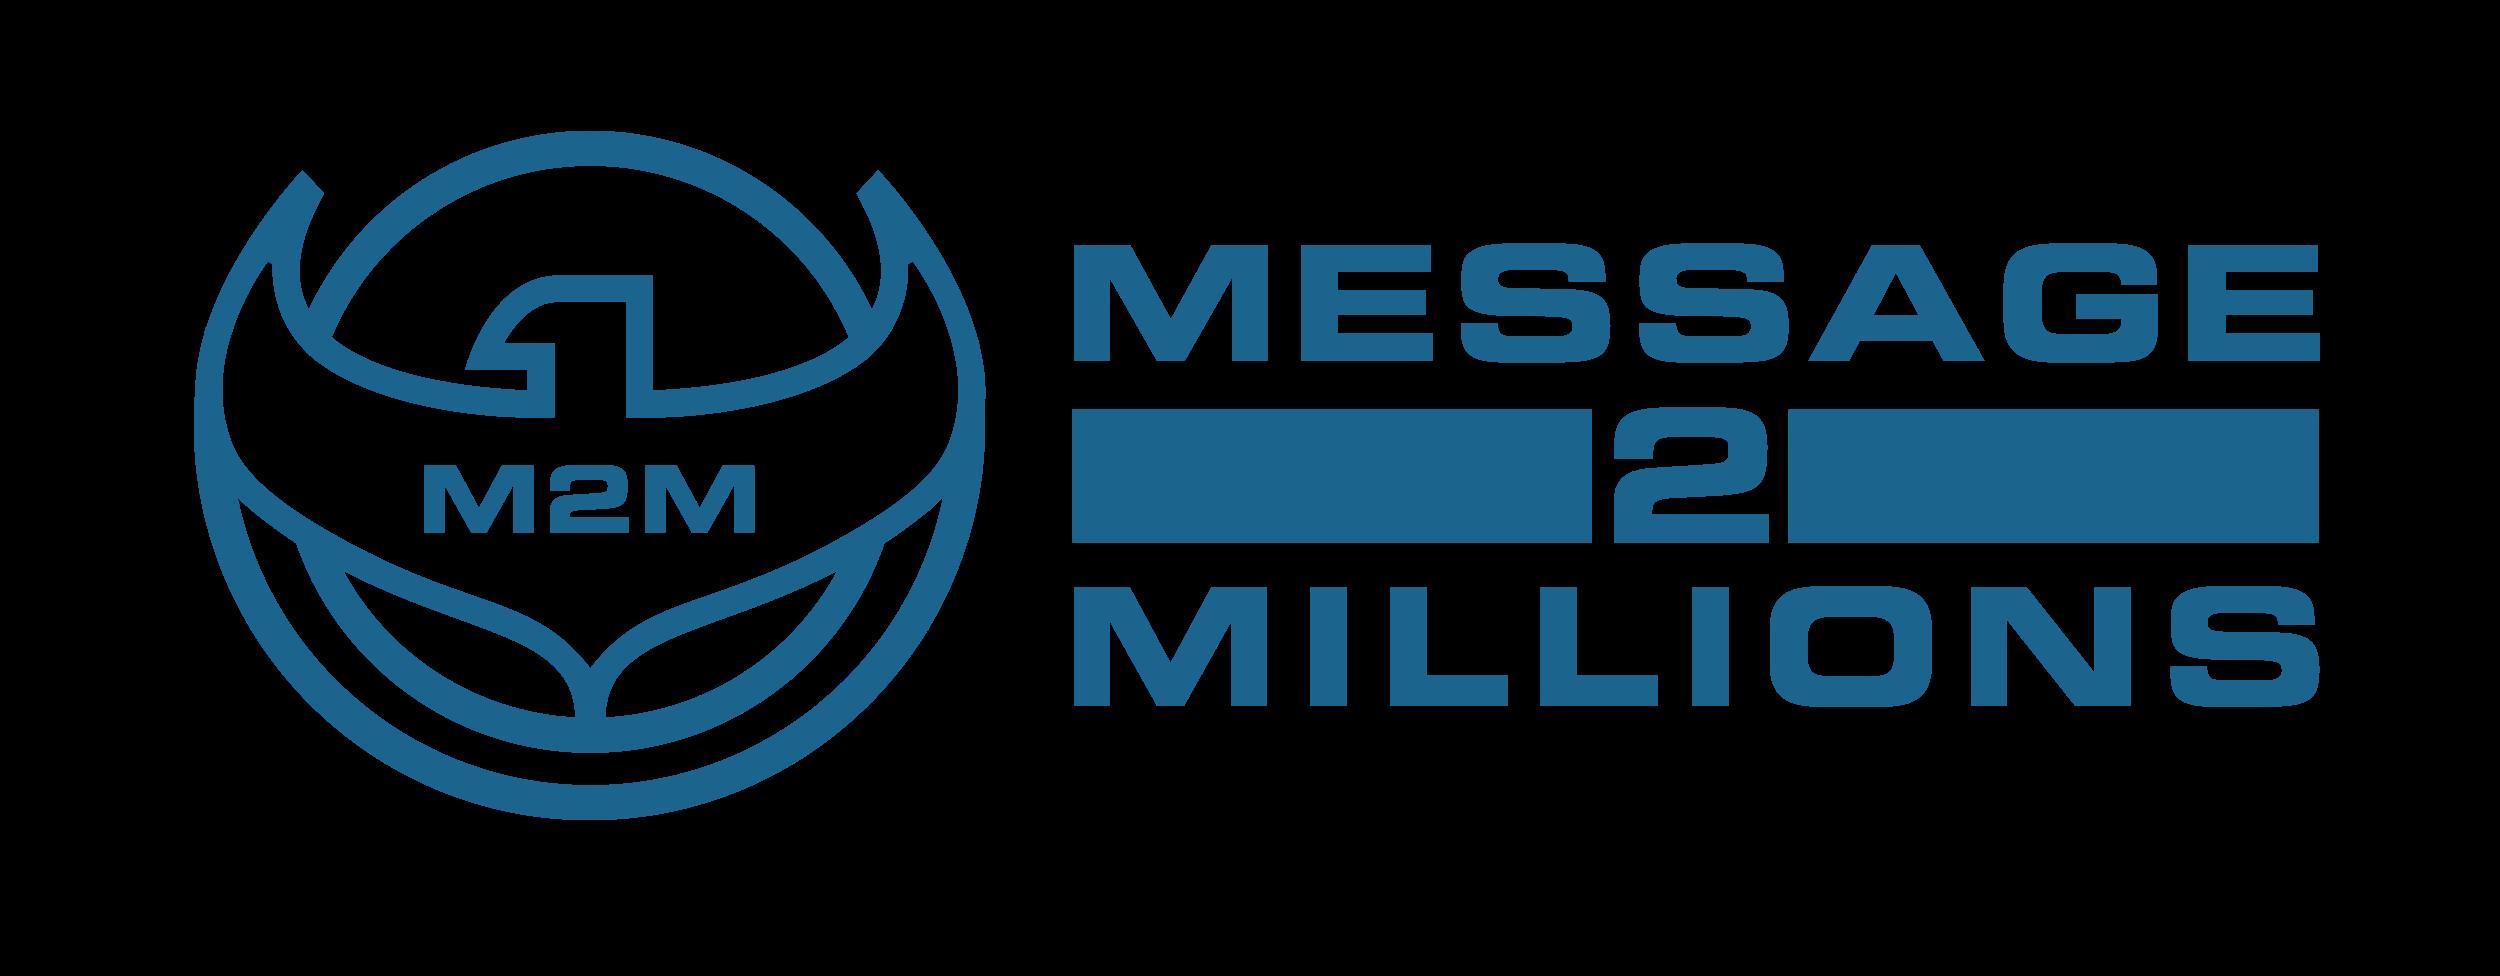 Message 2 Millions logo